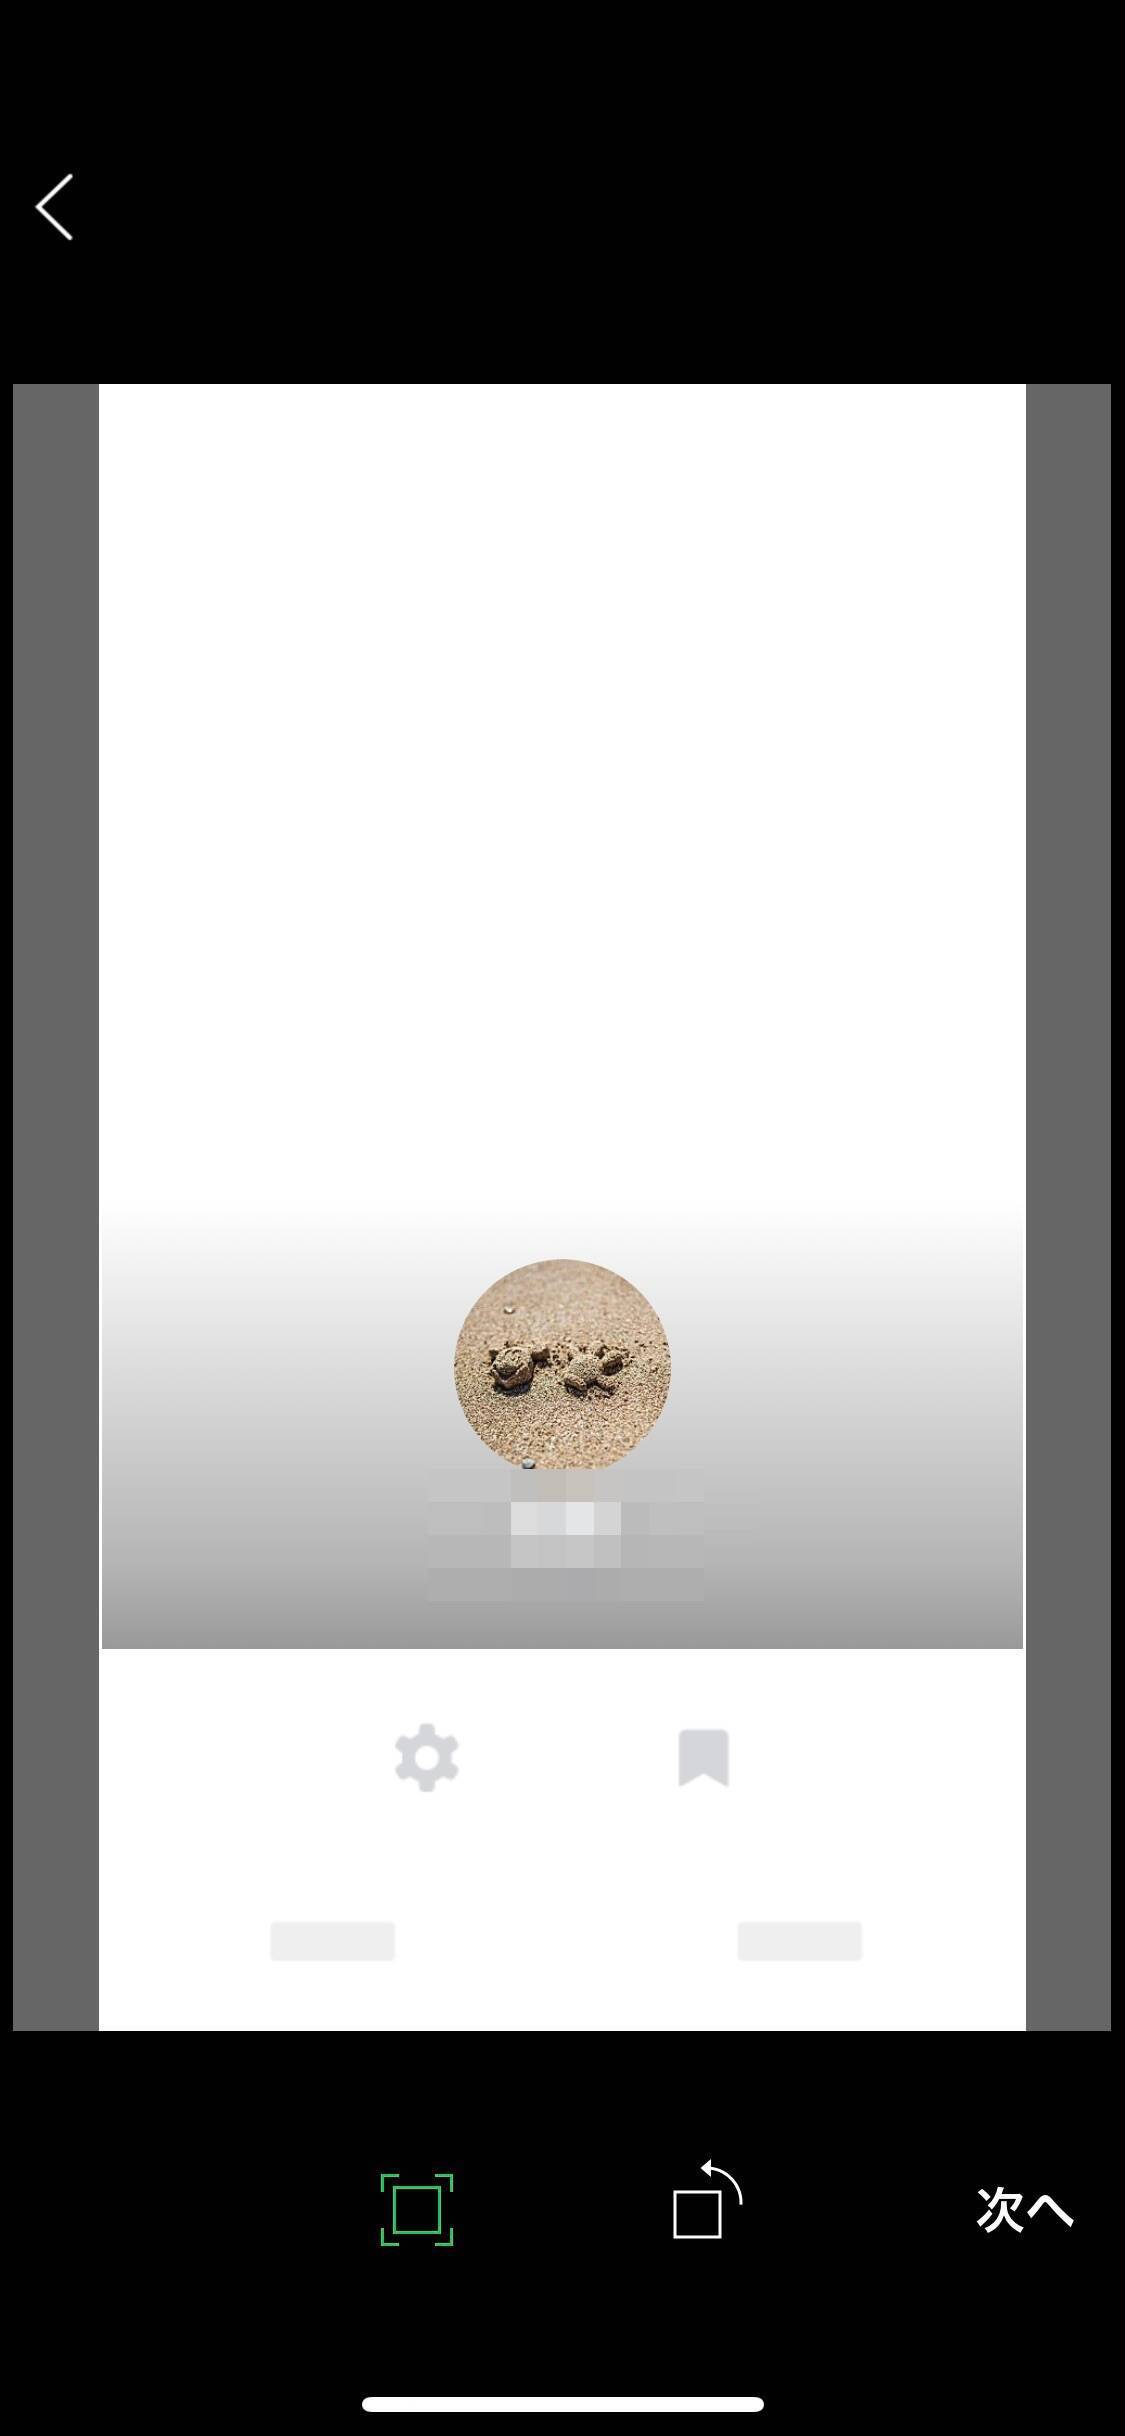 Lineのホーム画像の変更方法とは 裏技や豆知識も紹介 年2月22日 エキサイトニュース 5 5